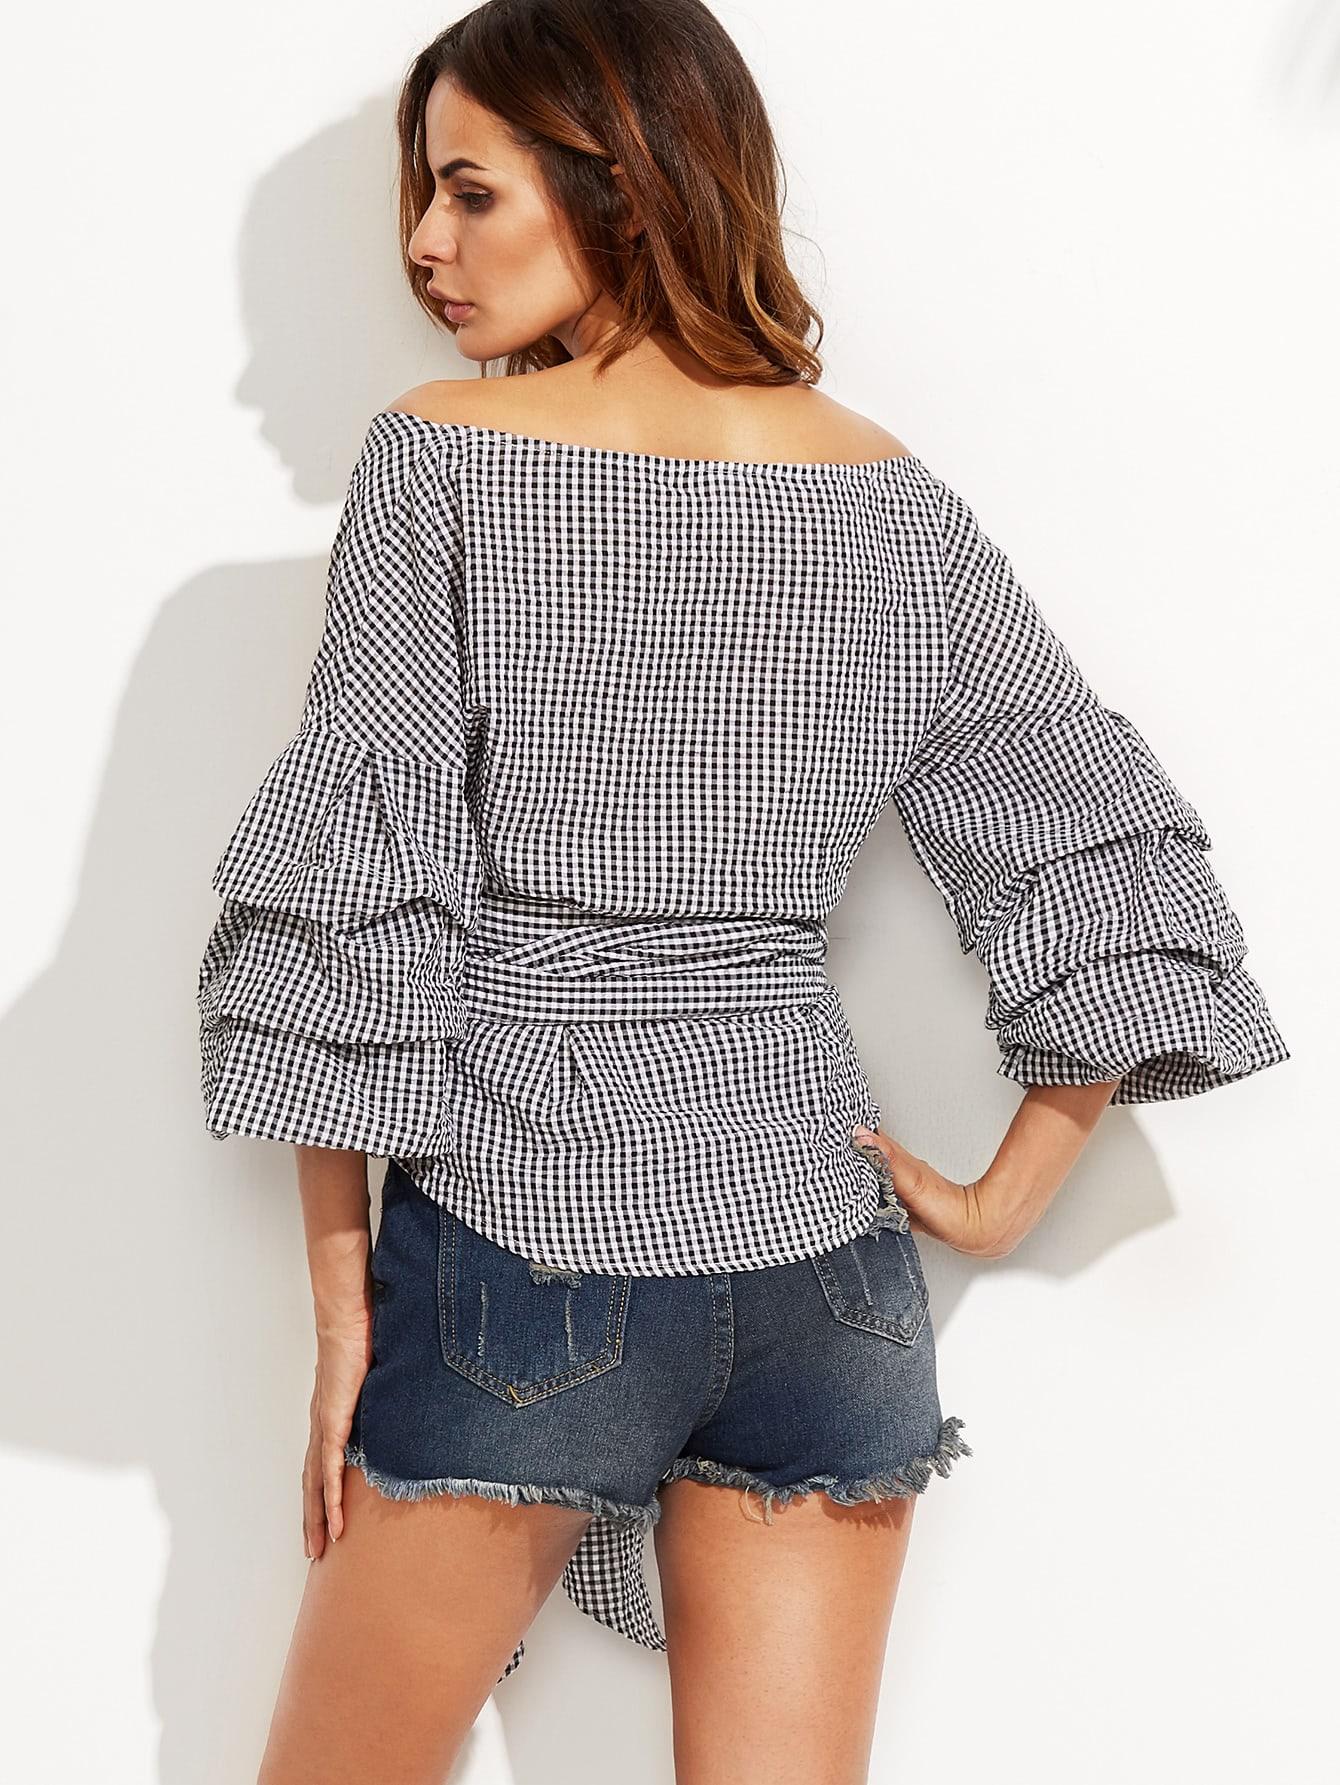 blouse160818501_2